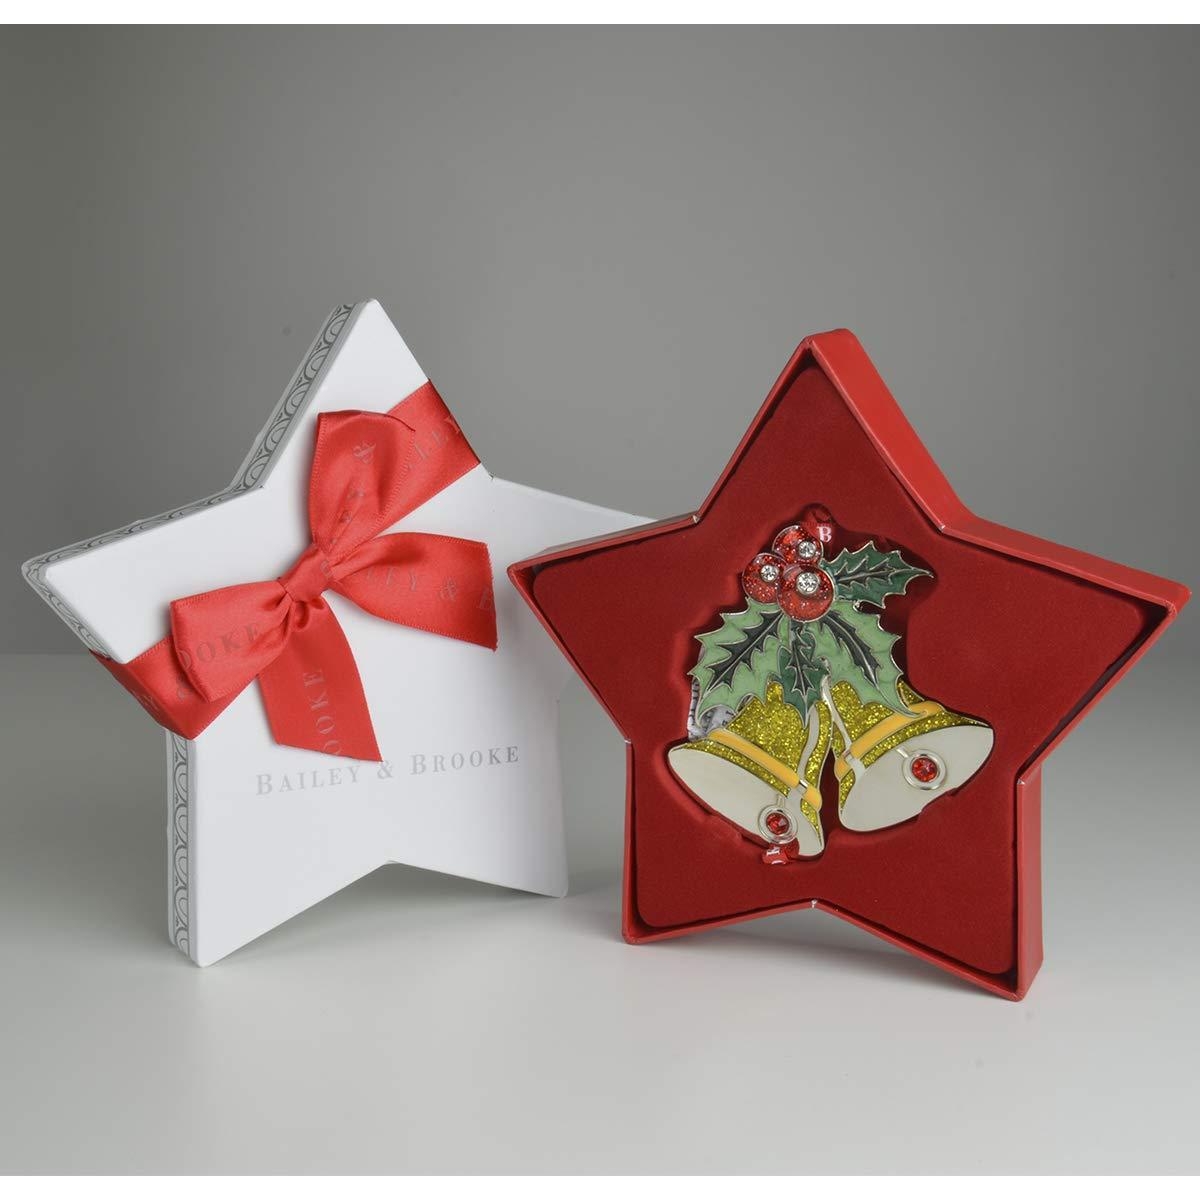 Bailey /& Brooke Sparkle Bells Decoration